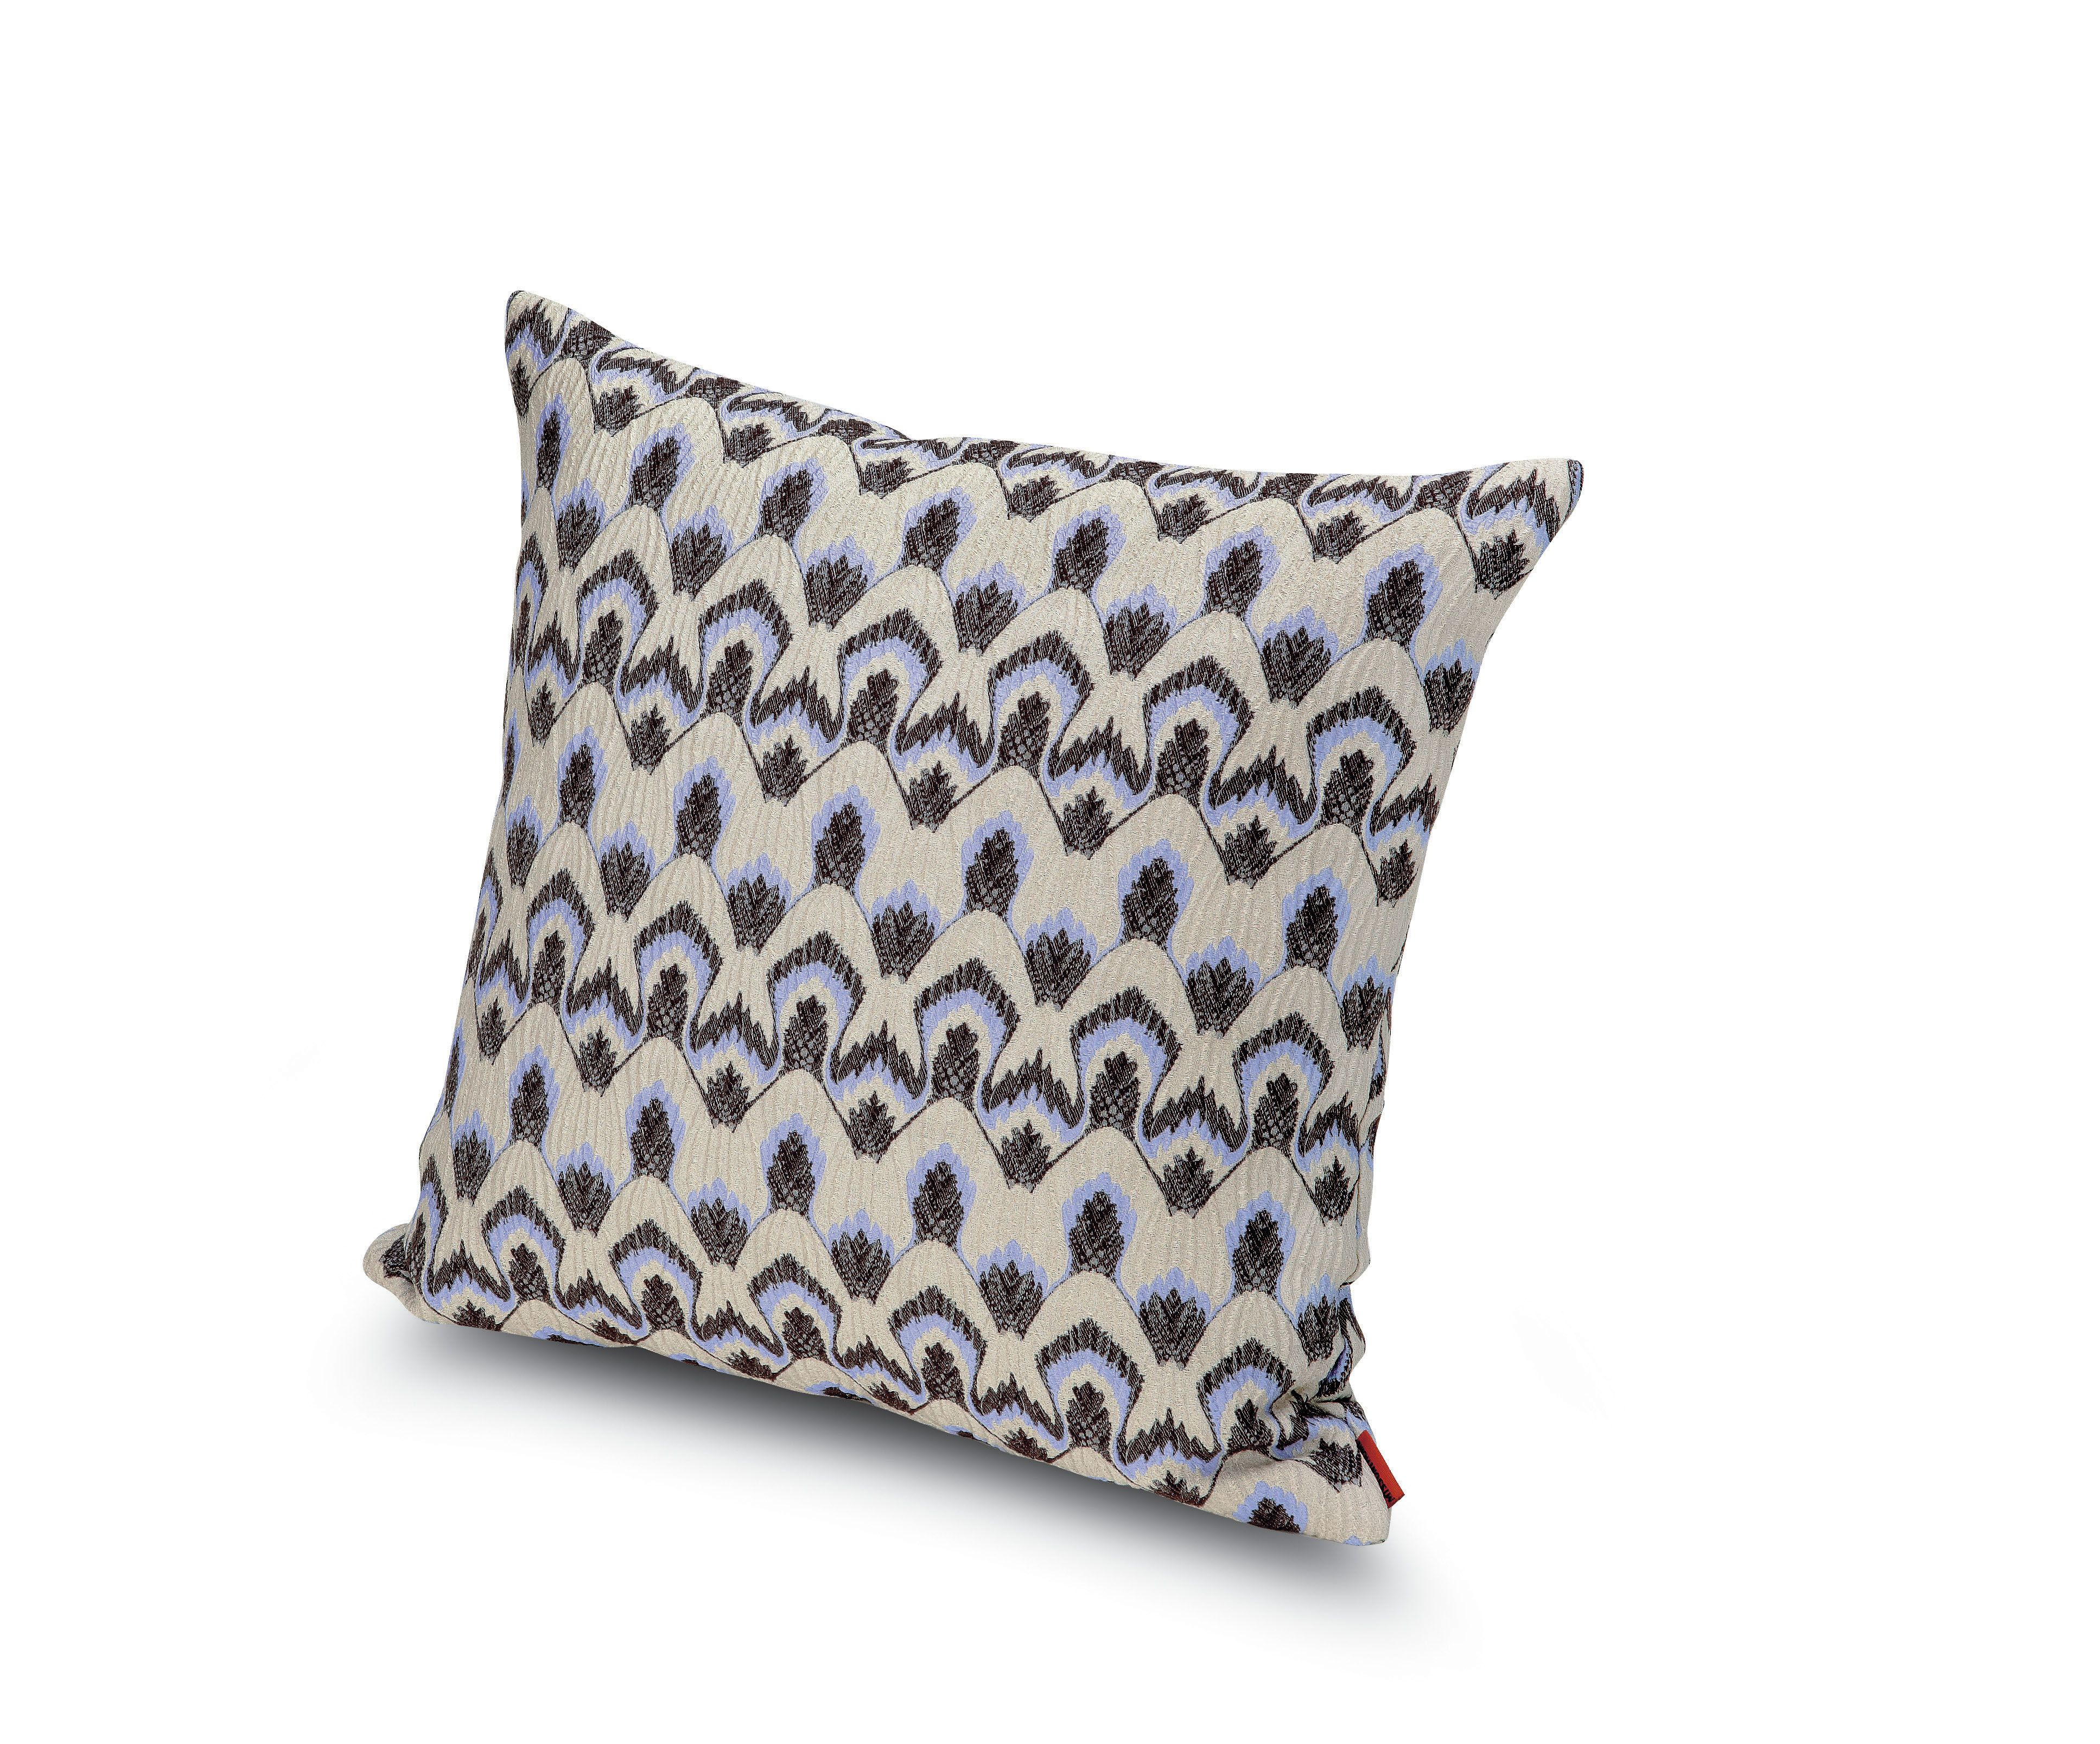 hotel com copy img pillow pillows edinburgh alex alexloves missoni loves